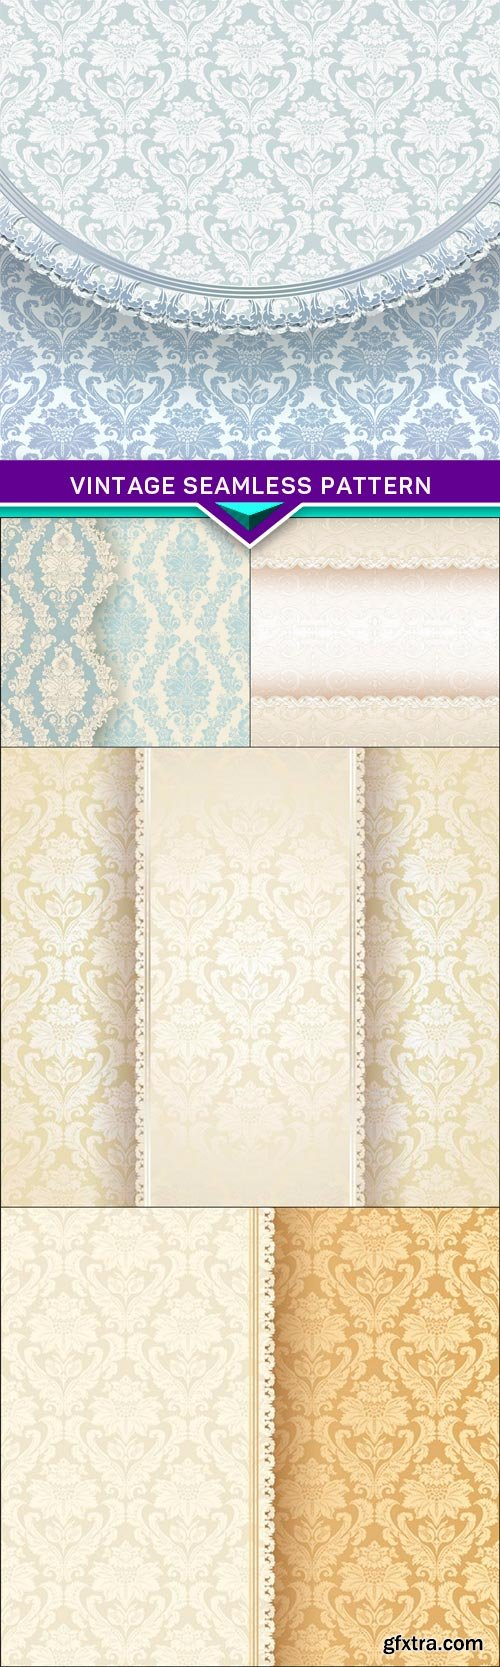 Vintage seamless pattern 5X EPS